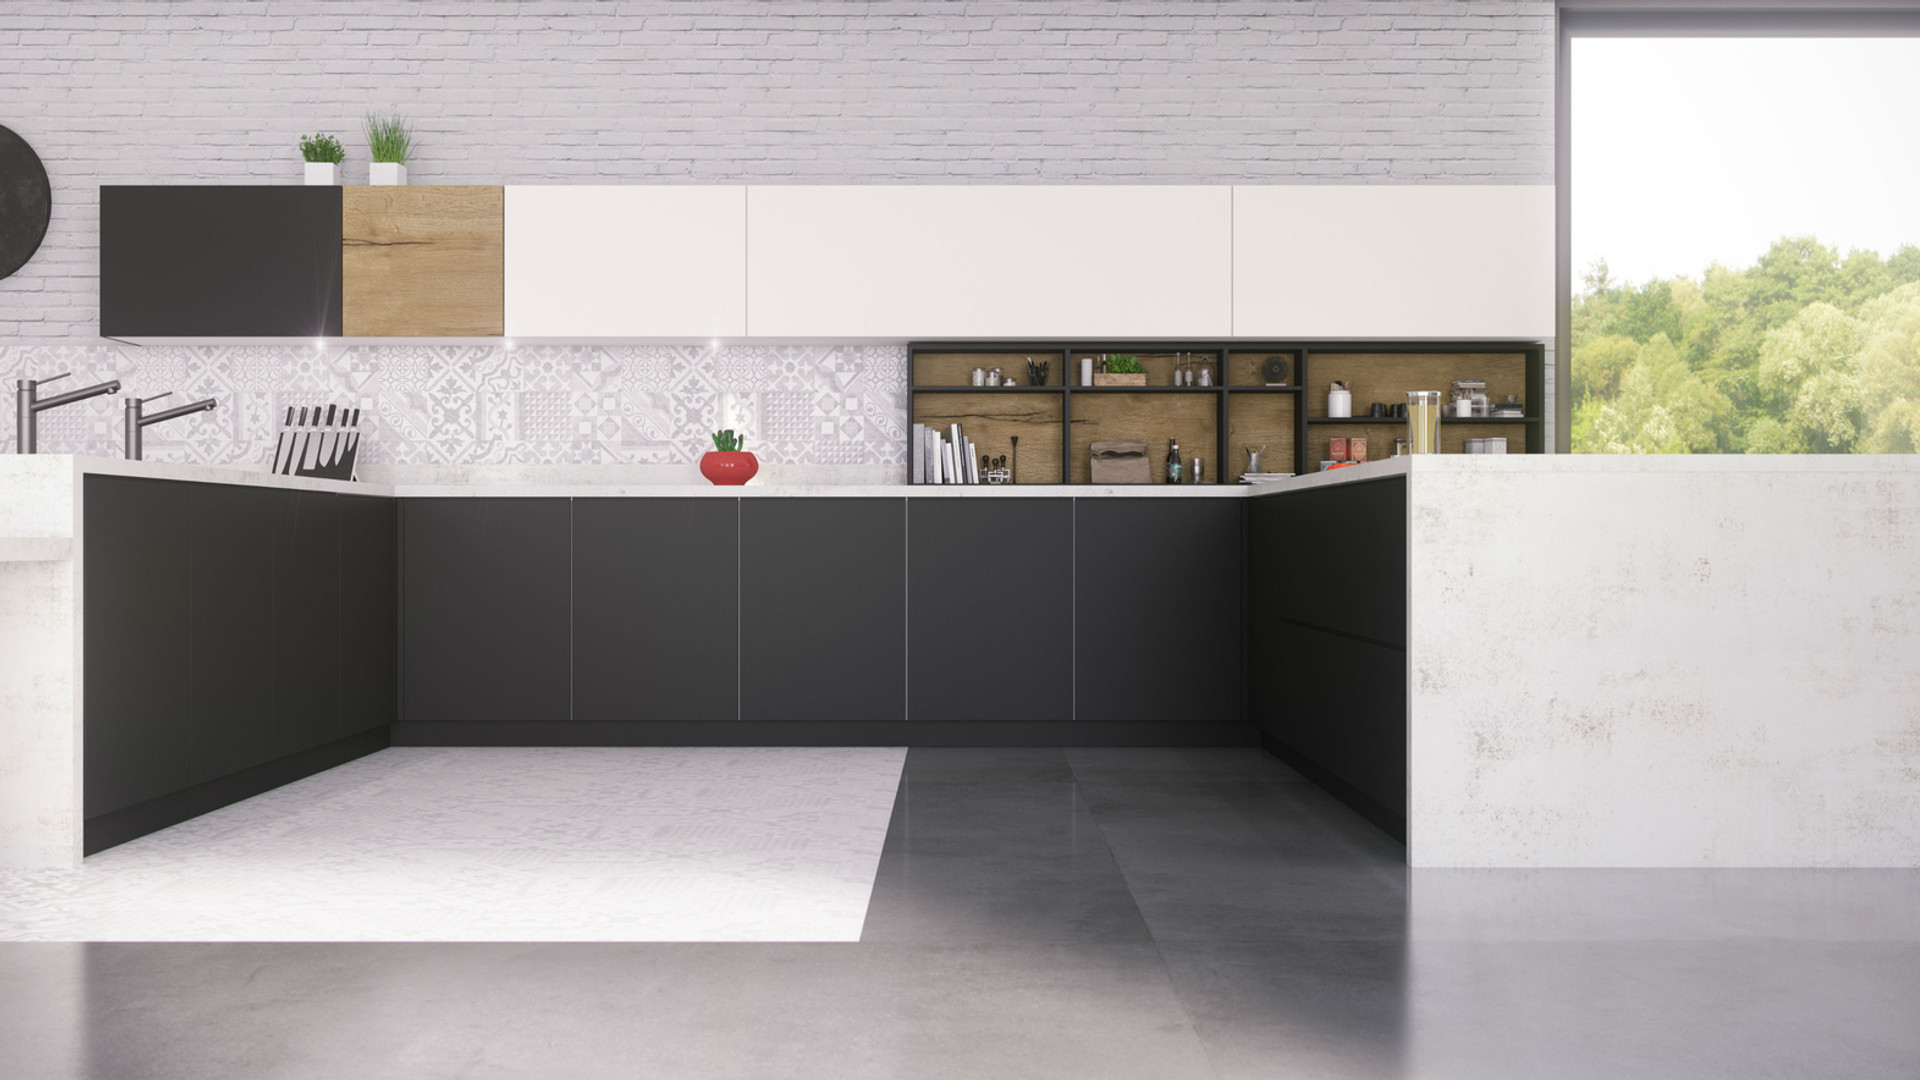 12 - Cocina Negro Advance + Blanco + Hal